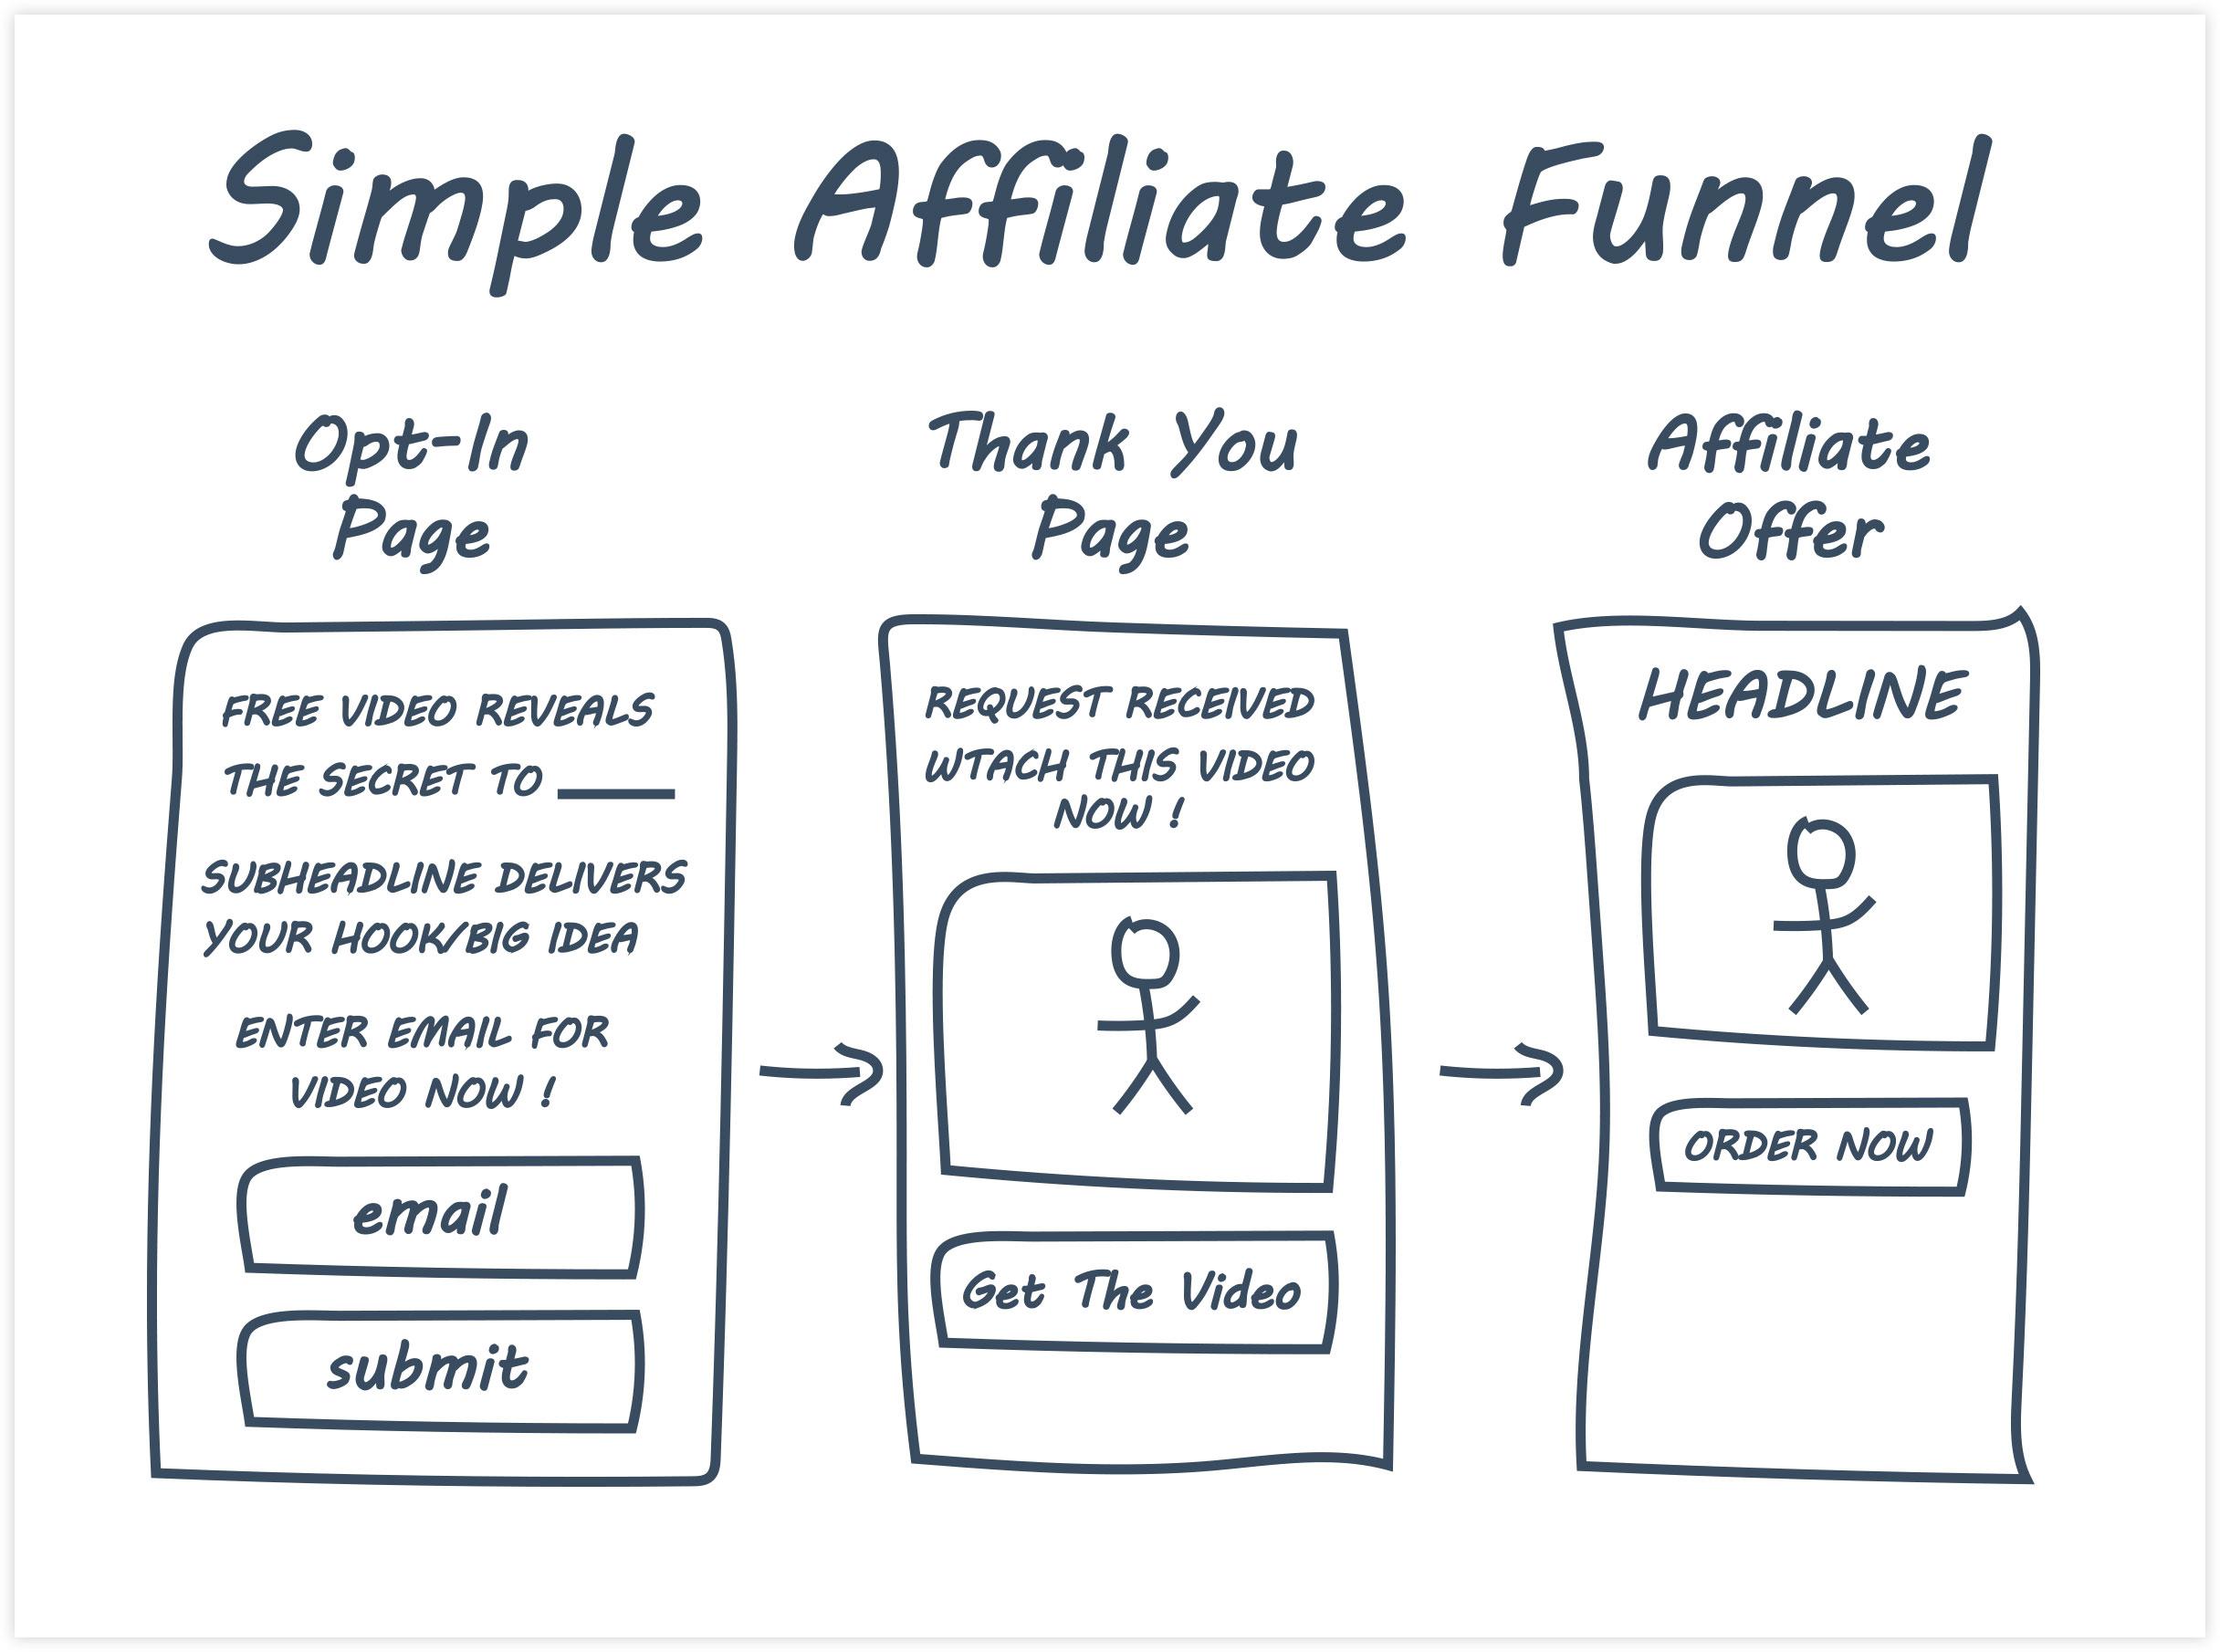 ClickFunnels Simple Affiliate Funnel